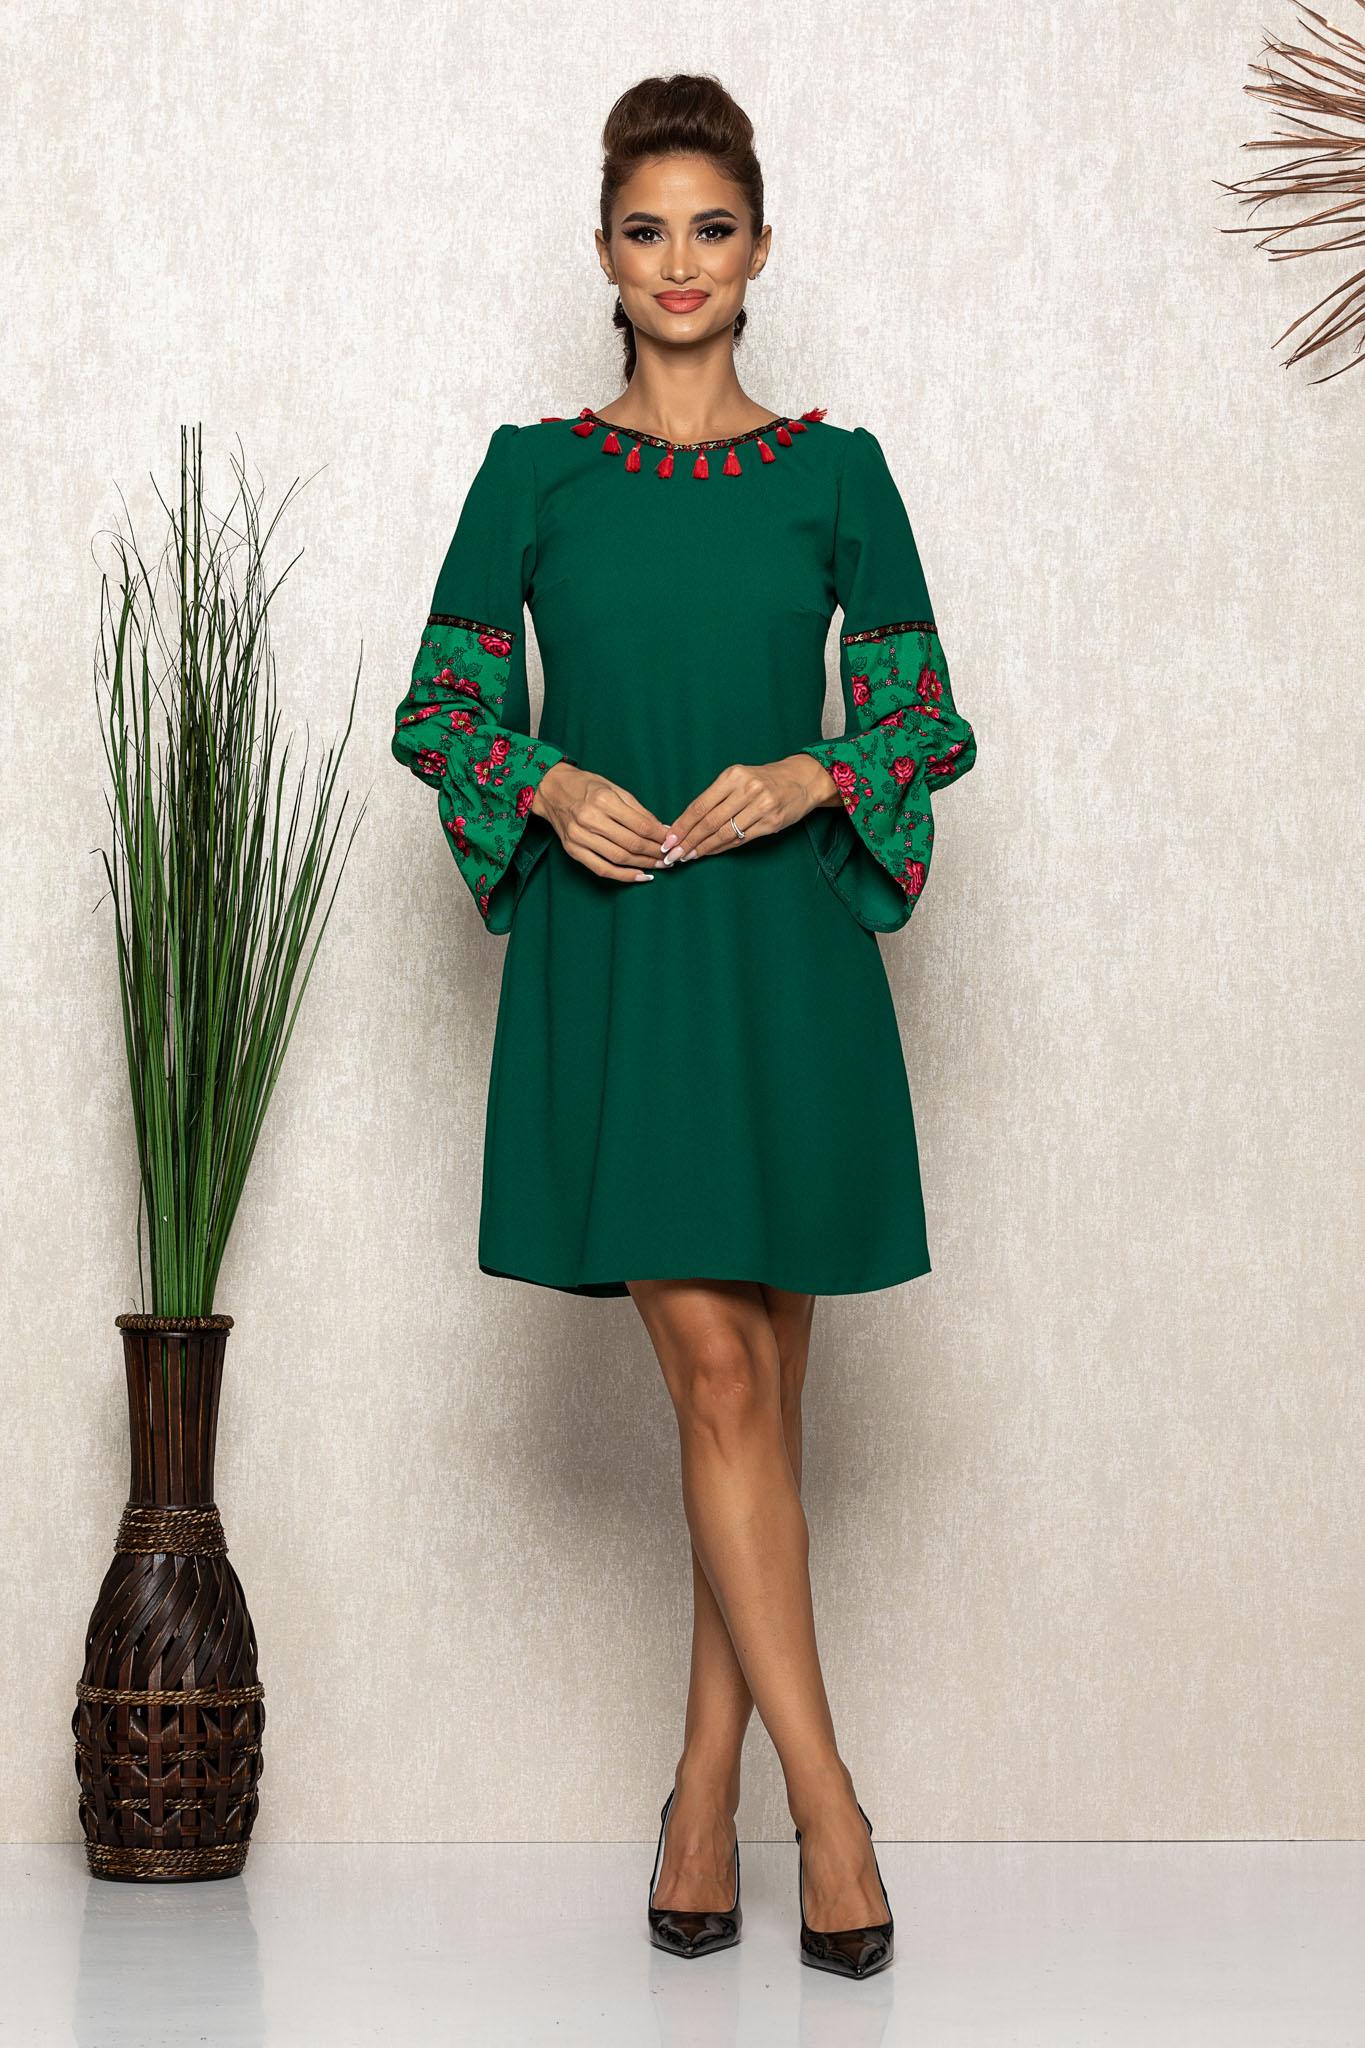 Rochie Moze Cecilia Verde Marimi Mari S (36)   M (38)   L (40)   XL (42)   XXL (44)   3XL (46)